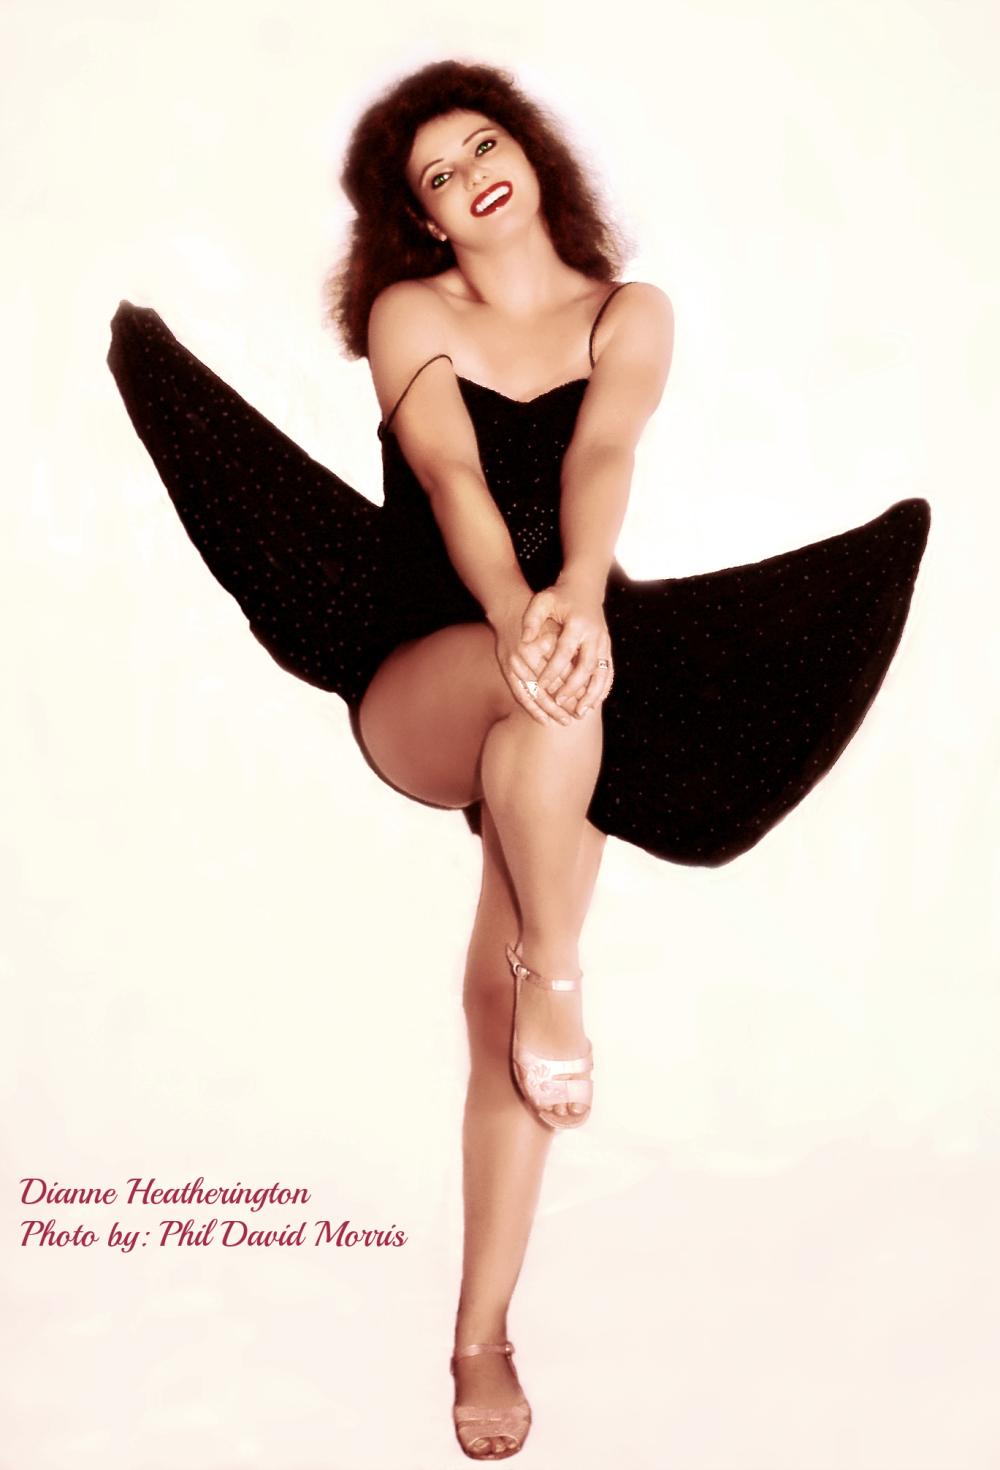 Dianne Heatherington